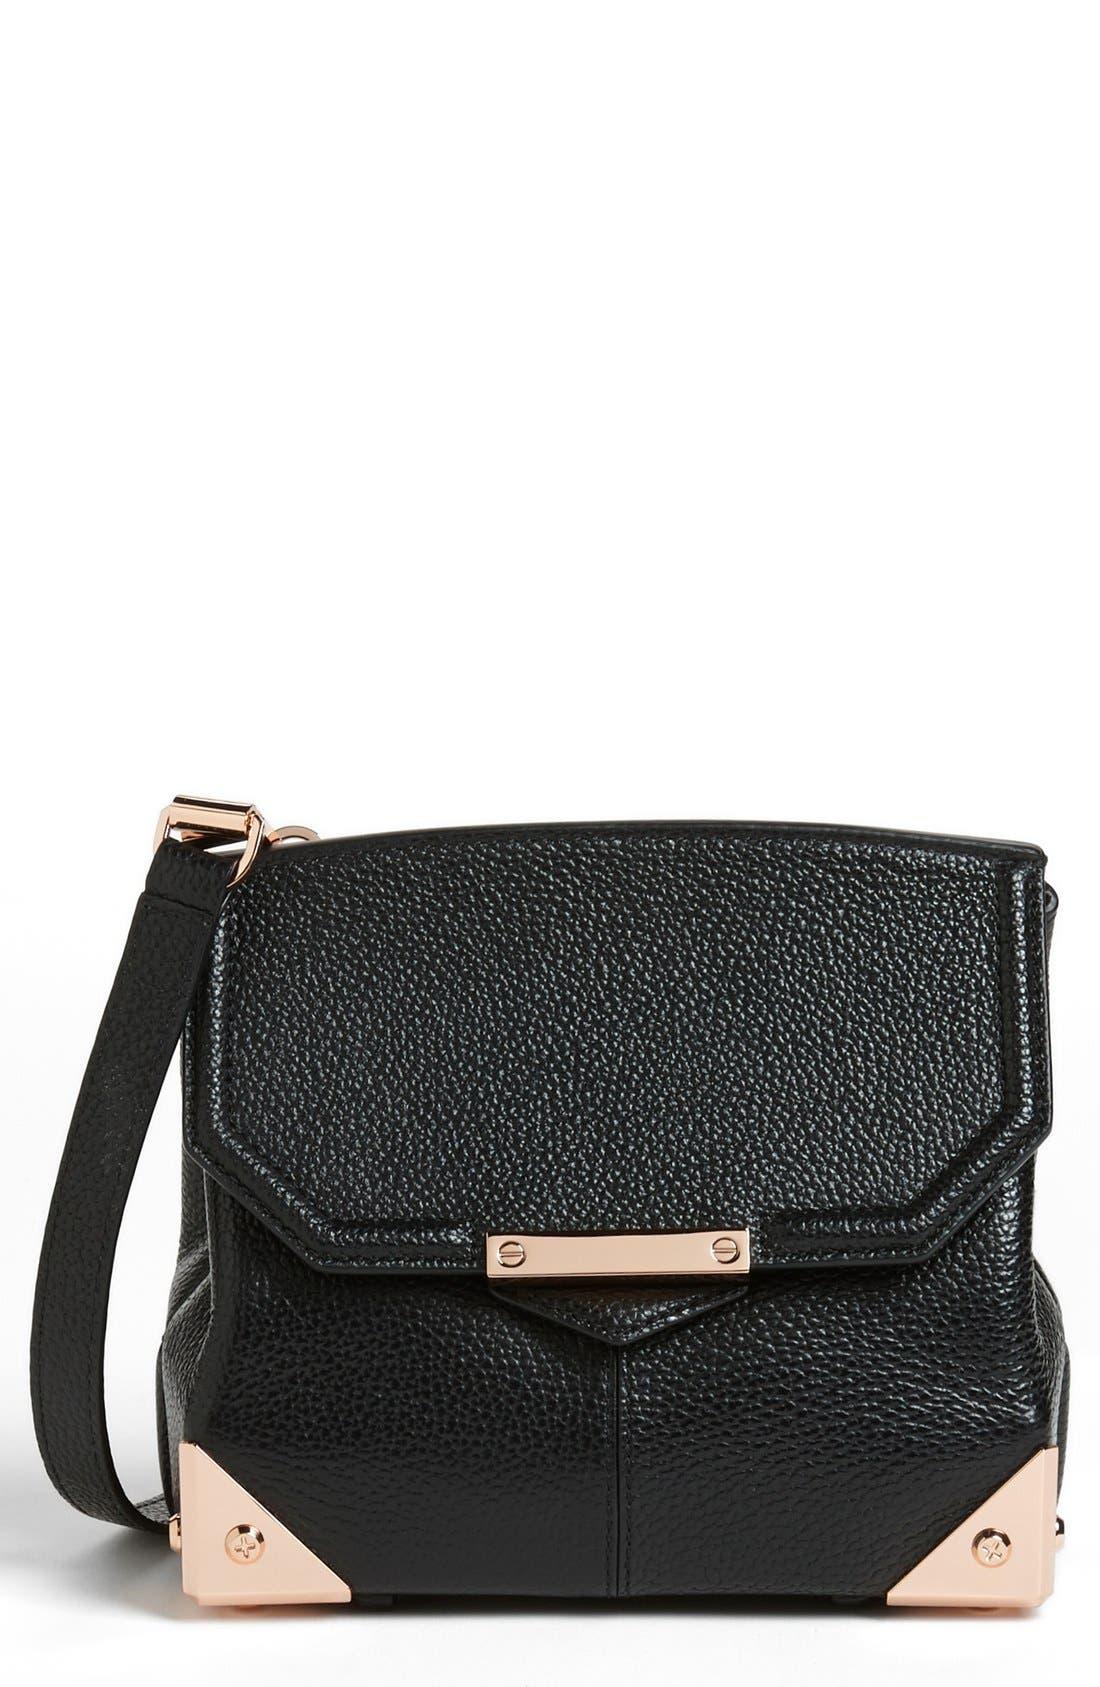 ALEXANDER WANG 'Marion - Prisma' Leather Crossbody Bag, Main, color, 001